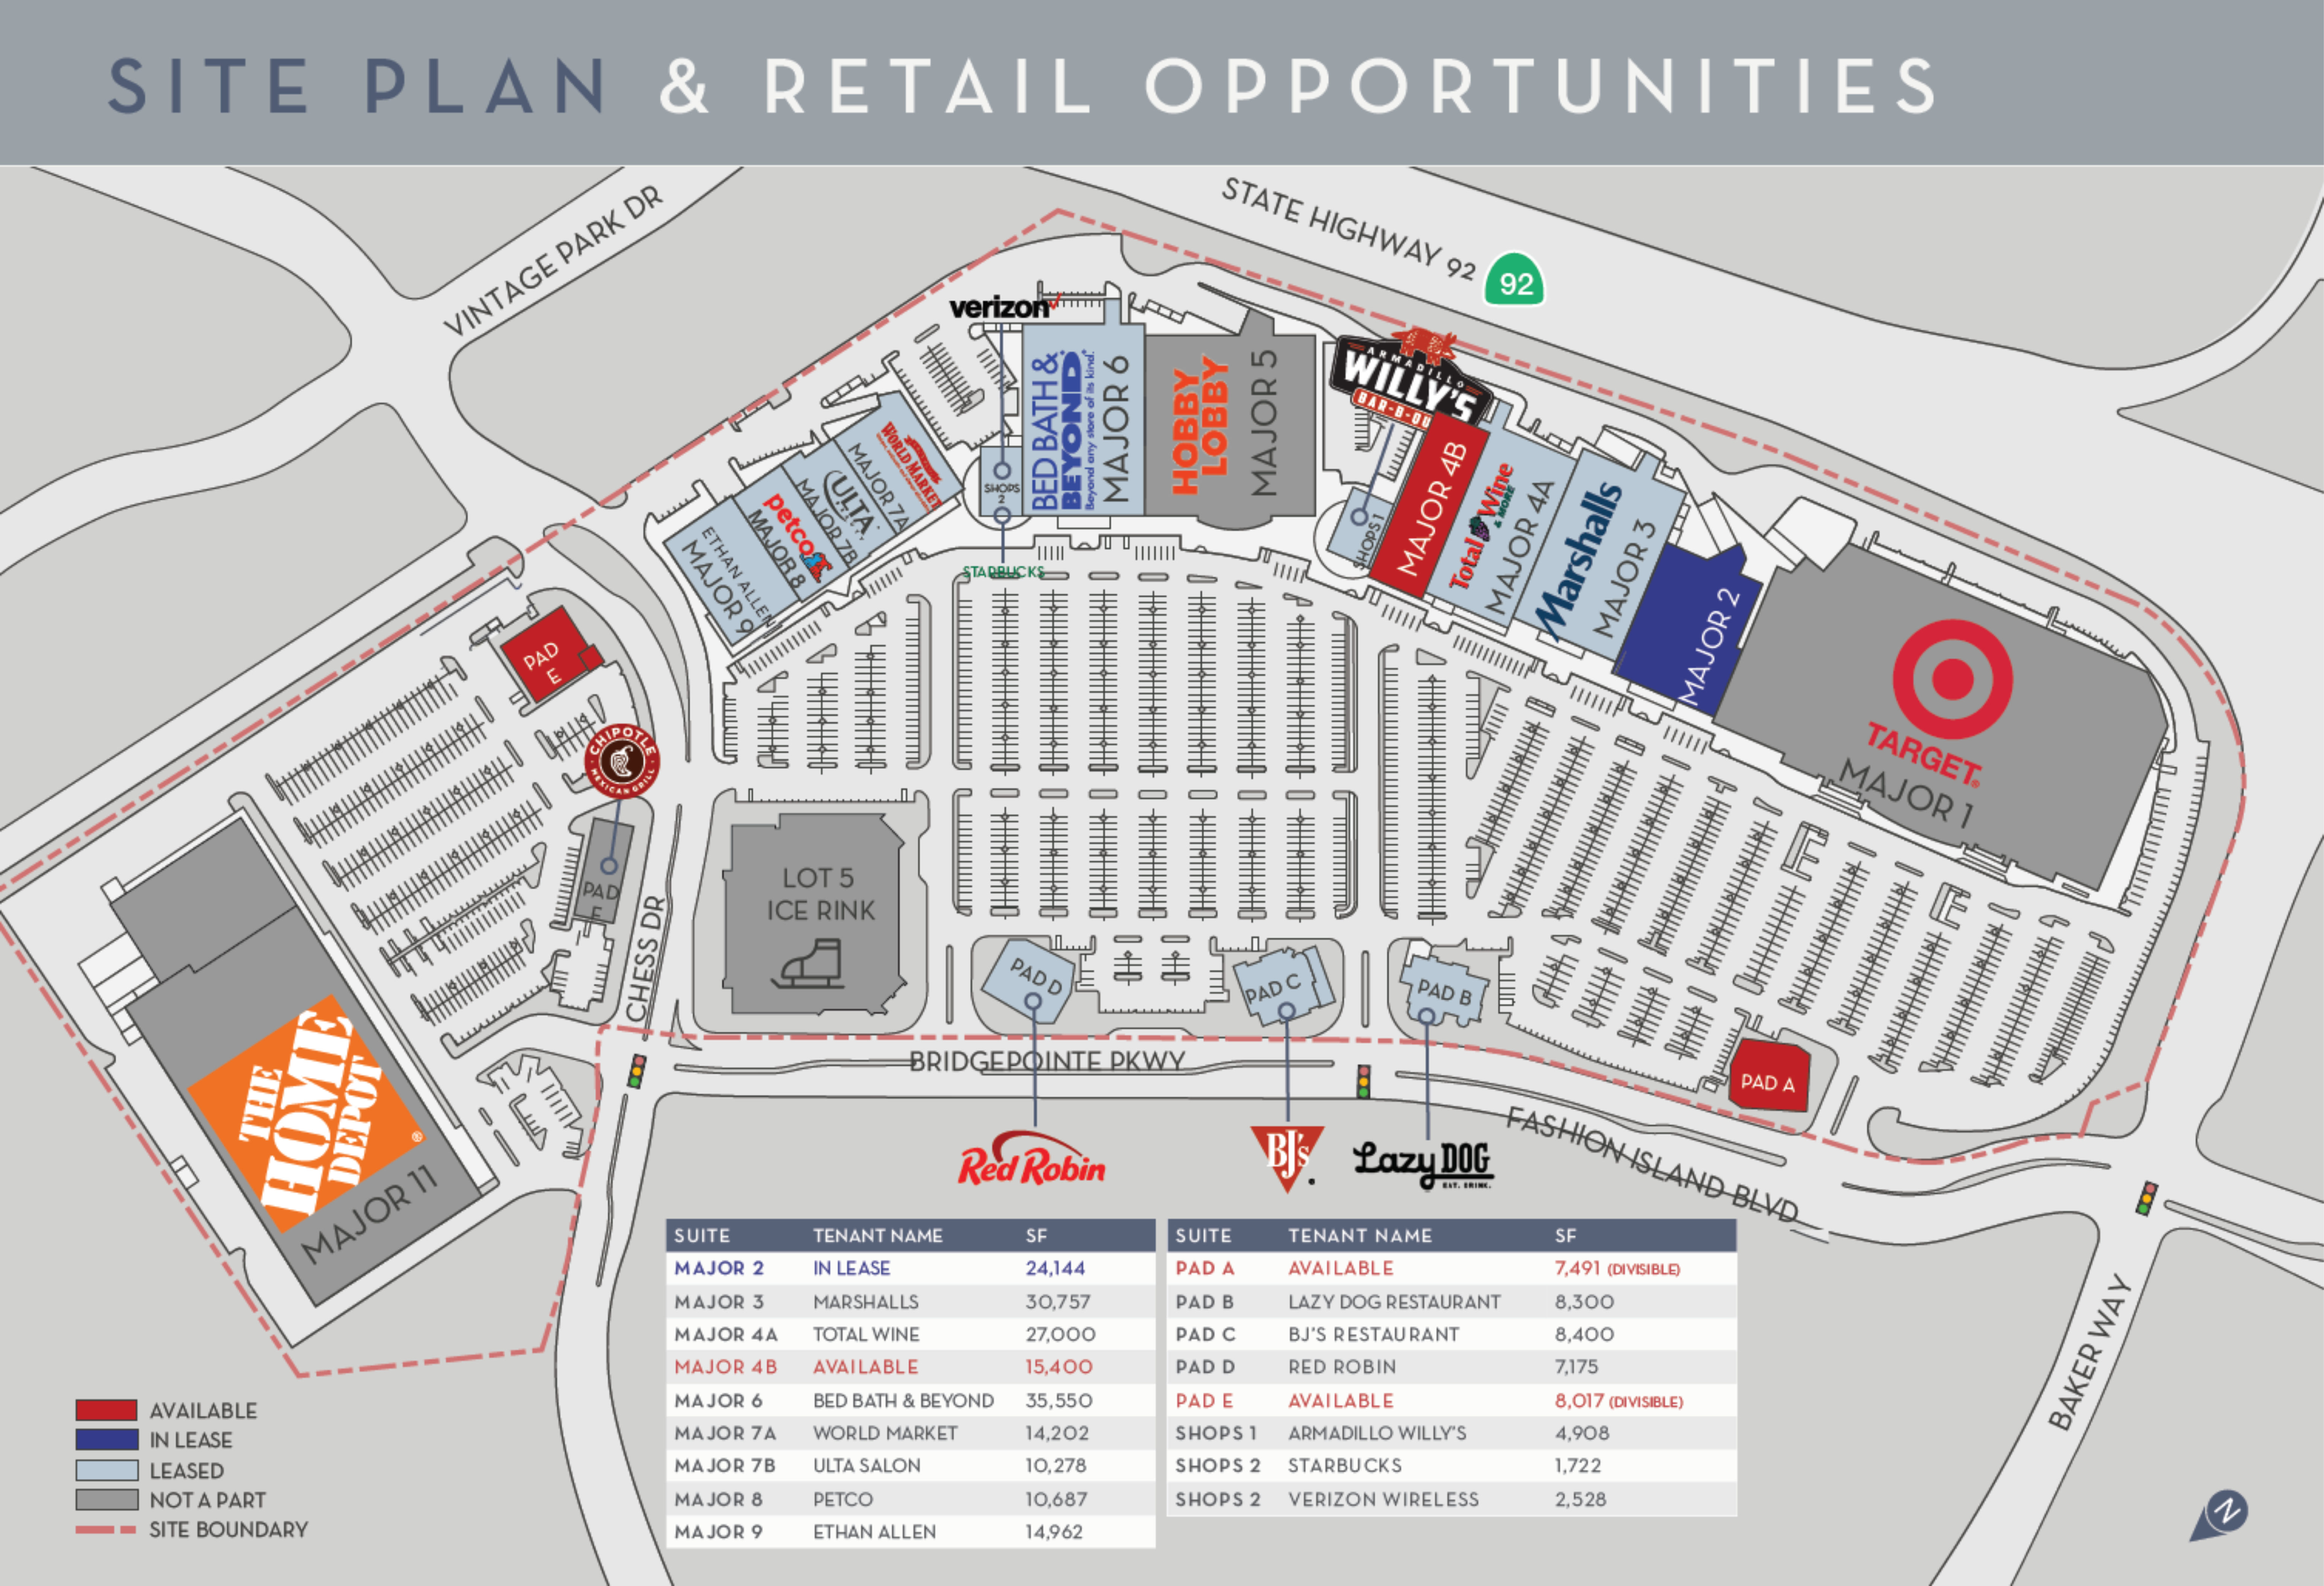 Bridgepointe Shopping Center: site plan